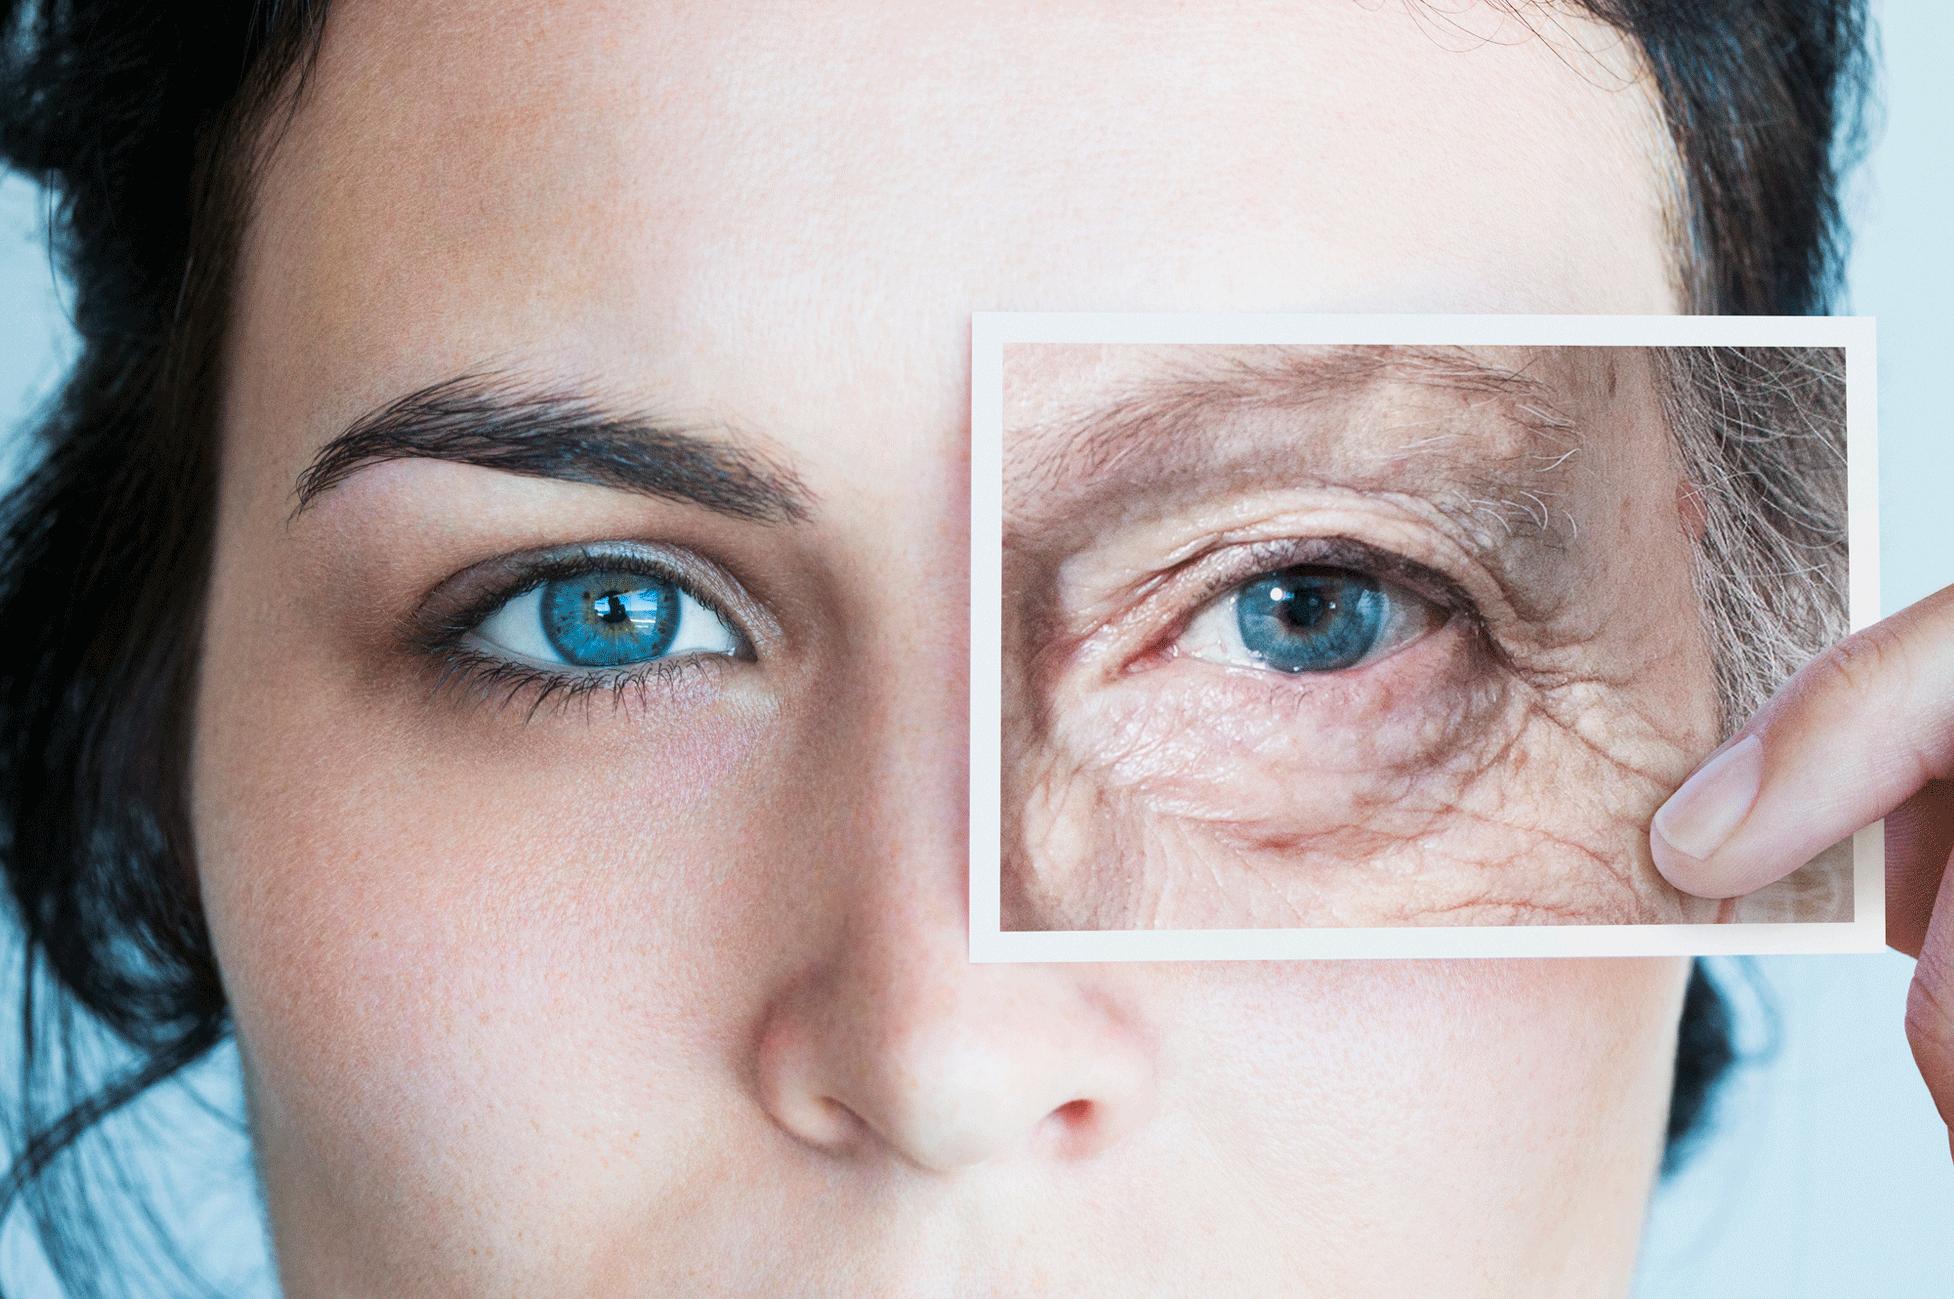 anti-aging wrinkle cream